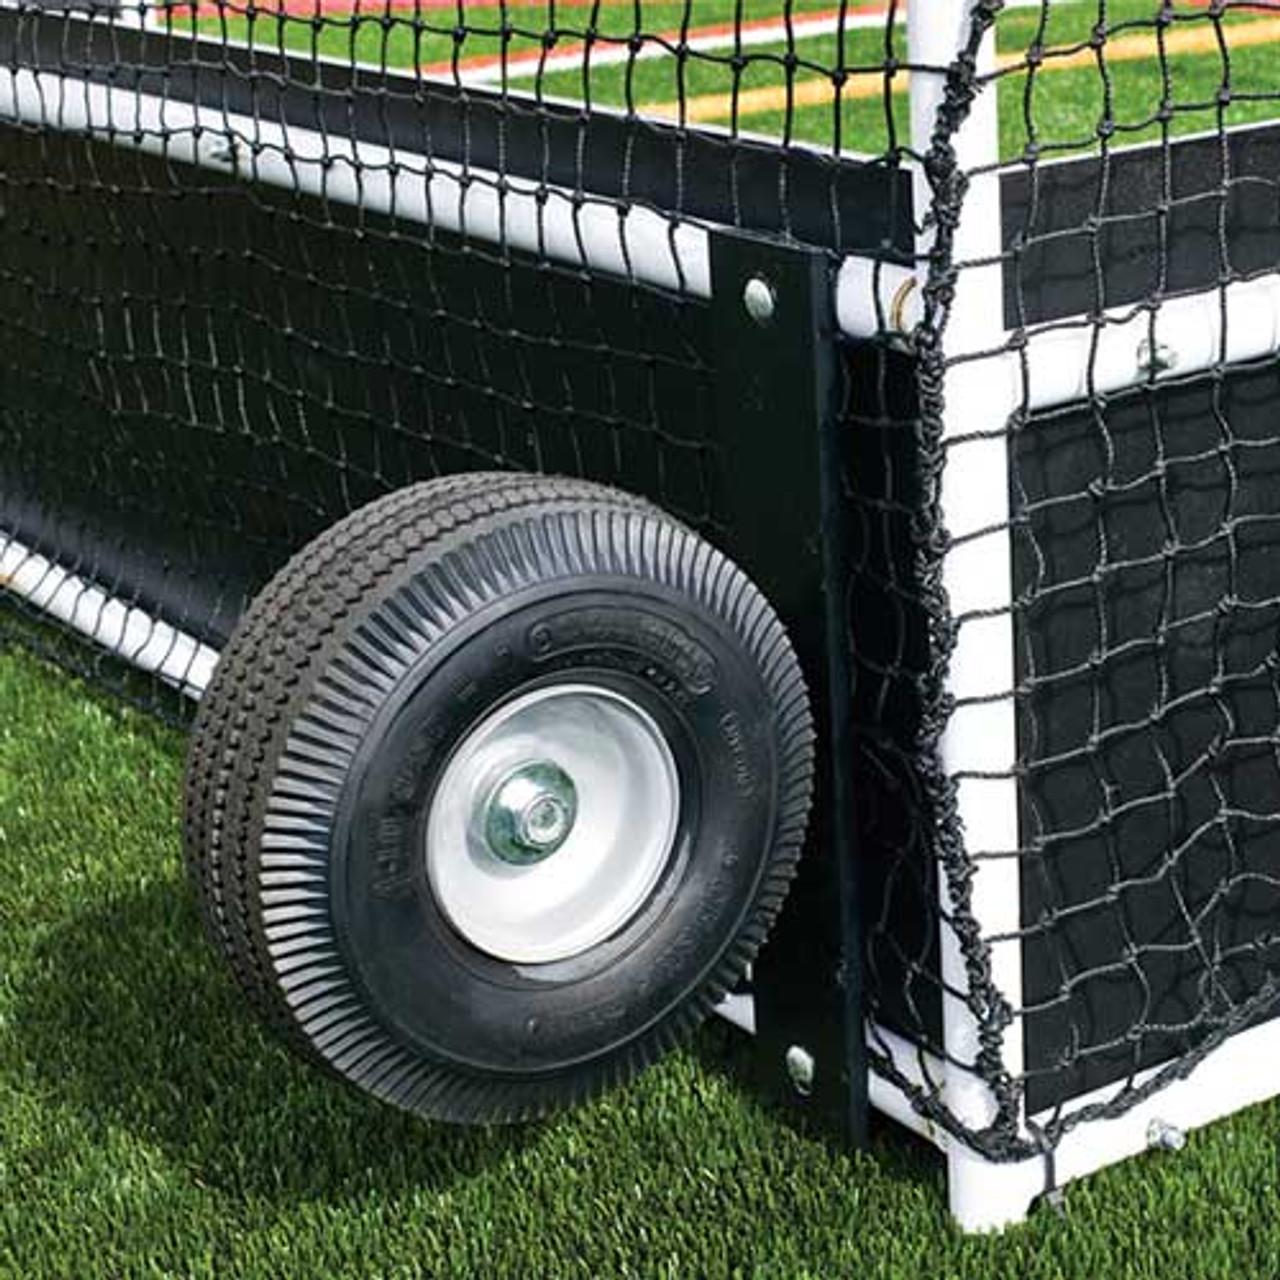 JayPro Official Field Hockey Goal Wheel Kit